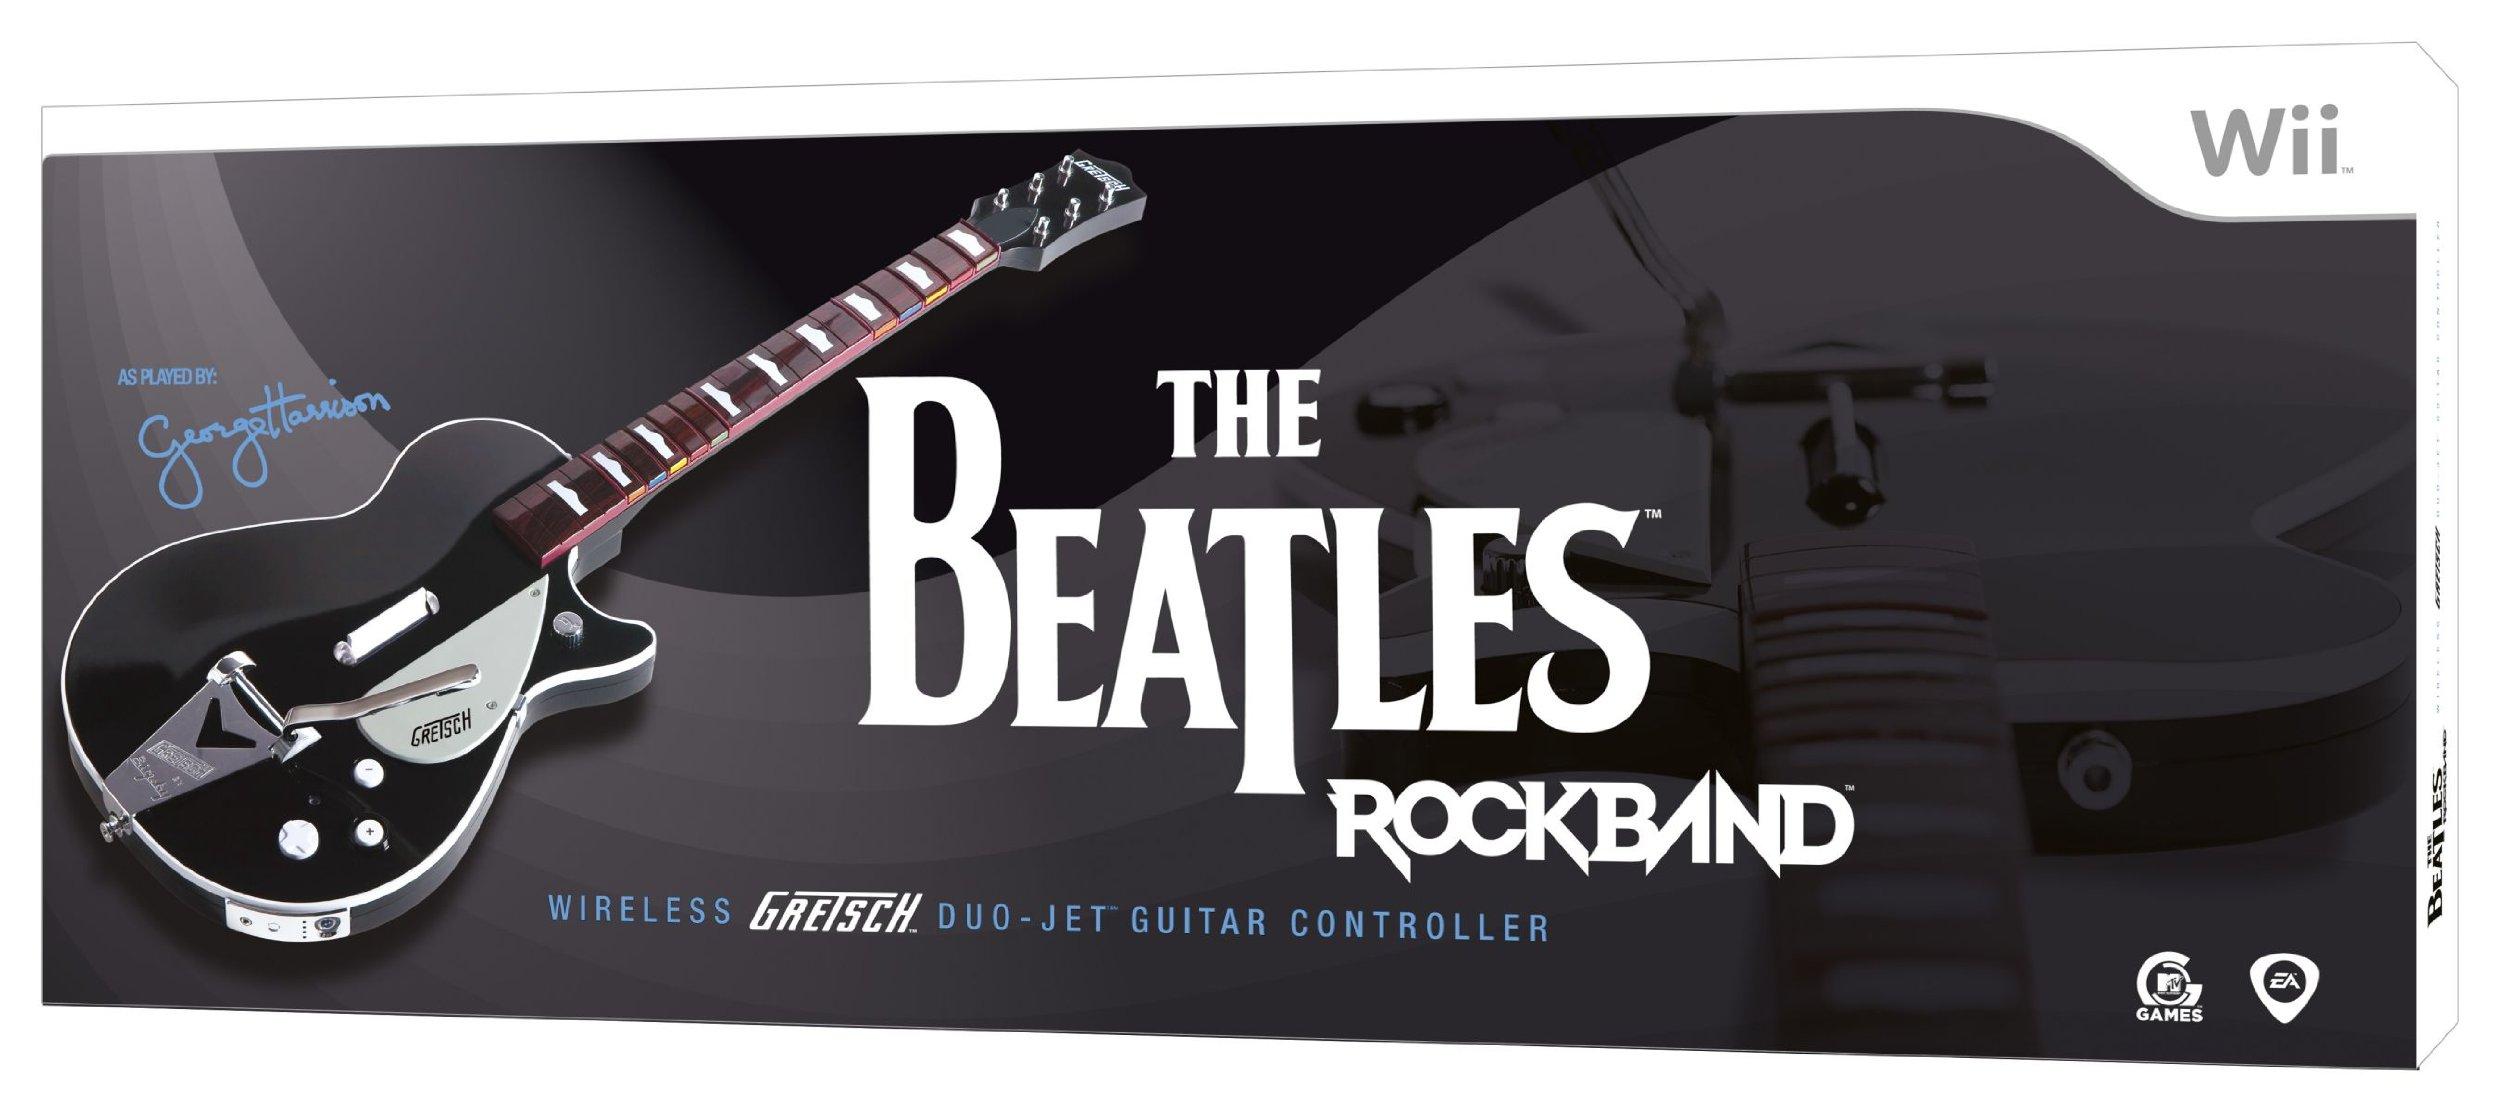 The Beatles: Rock Band Guitarra Gretsch Duo-jet: Amazon.es ...